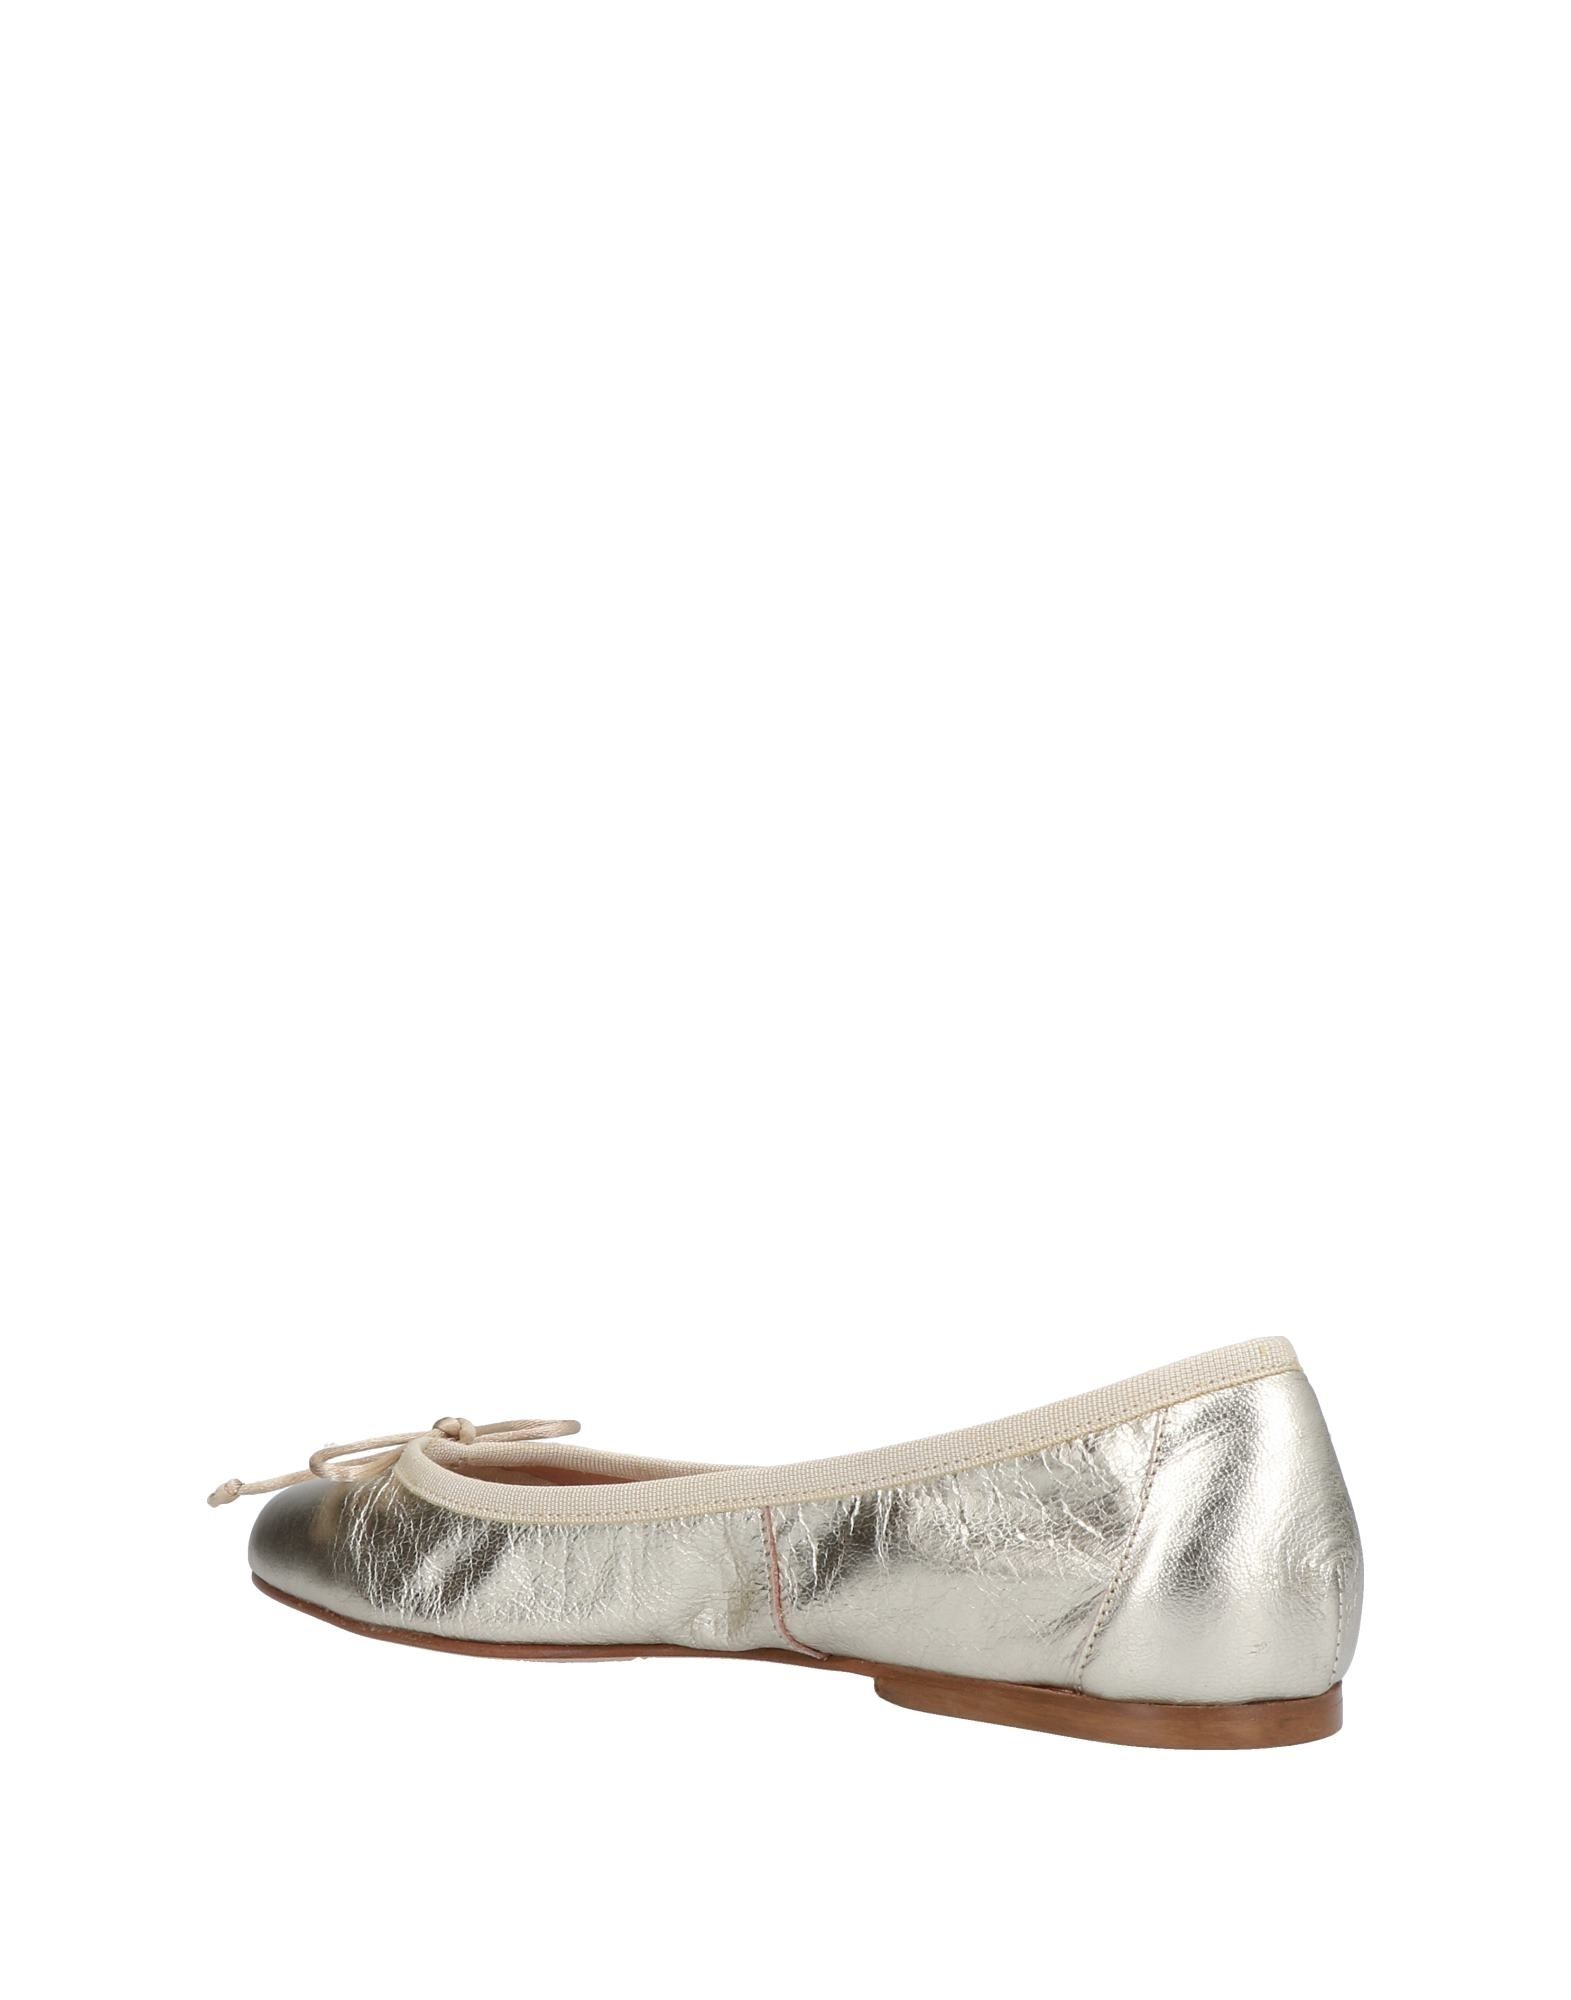 Calzaiuoli Toscani Ballerinas Damen  11461777IH beliebte Gute Qualität beliebte 11461777IH Schuhe 0c6a0e